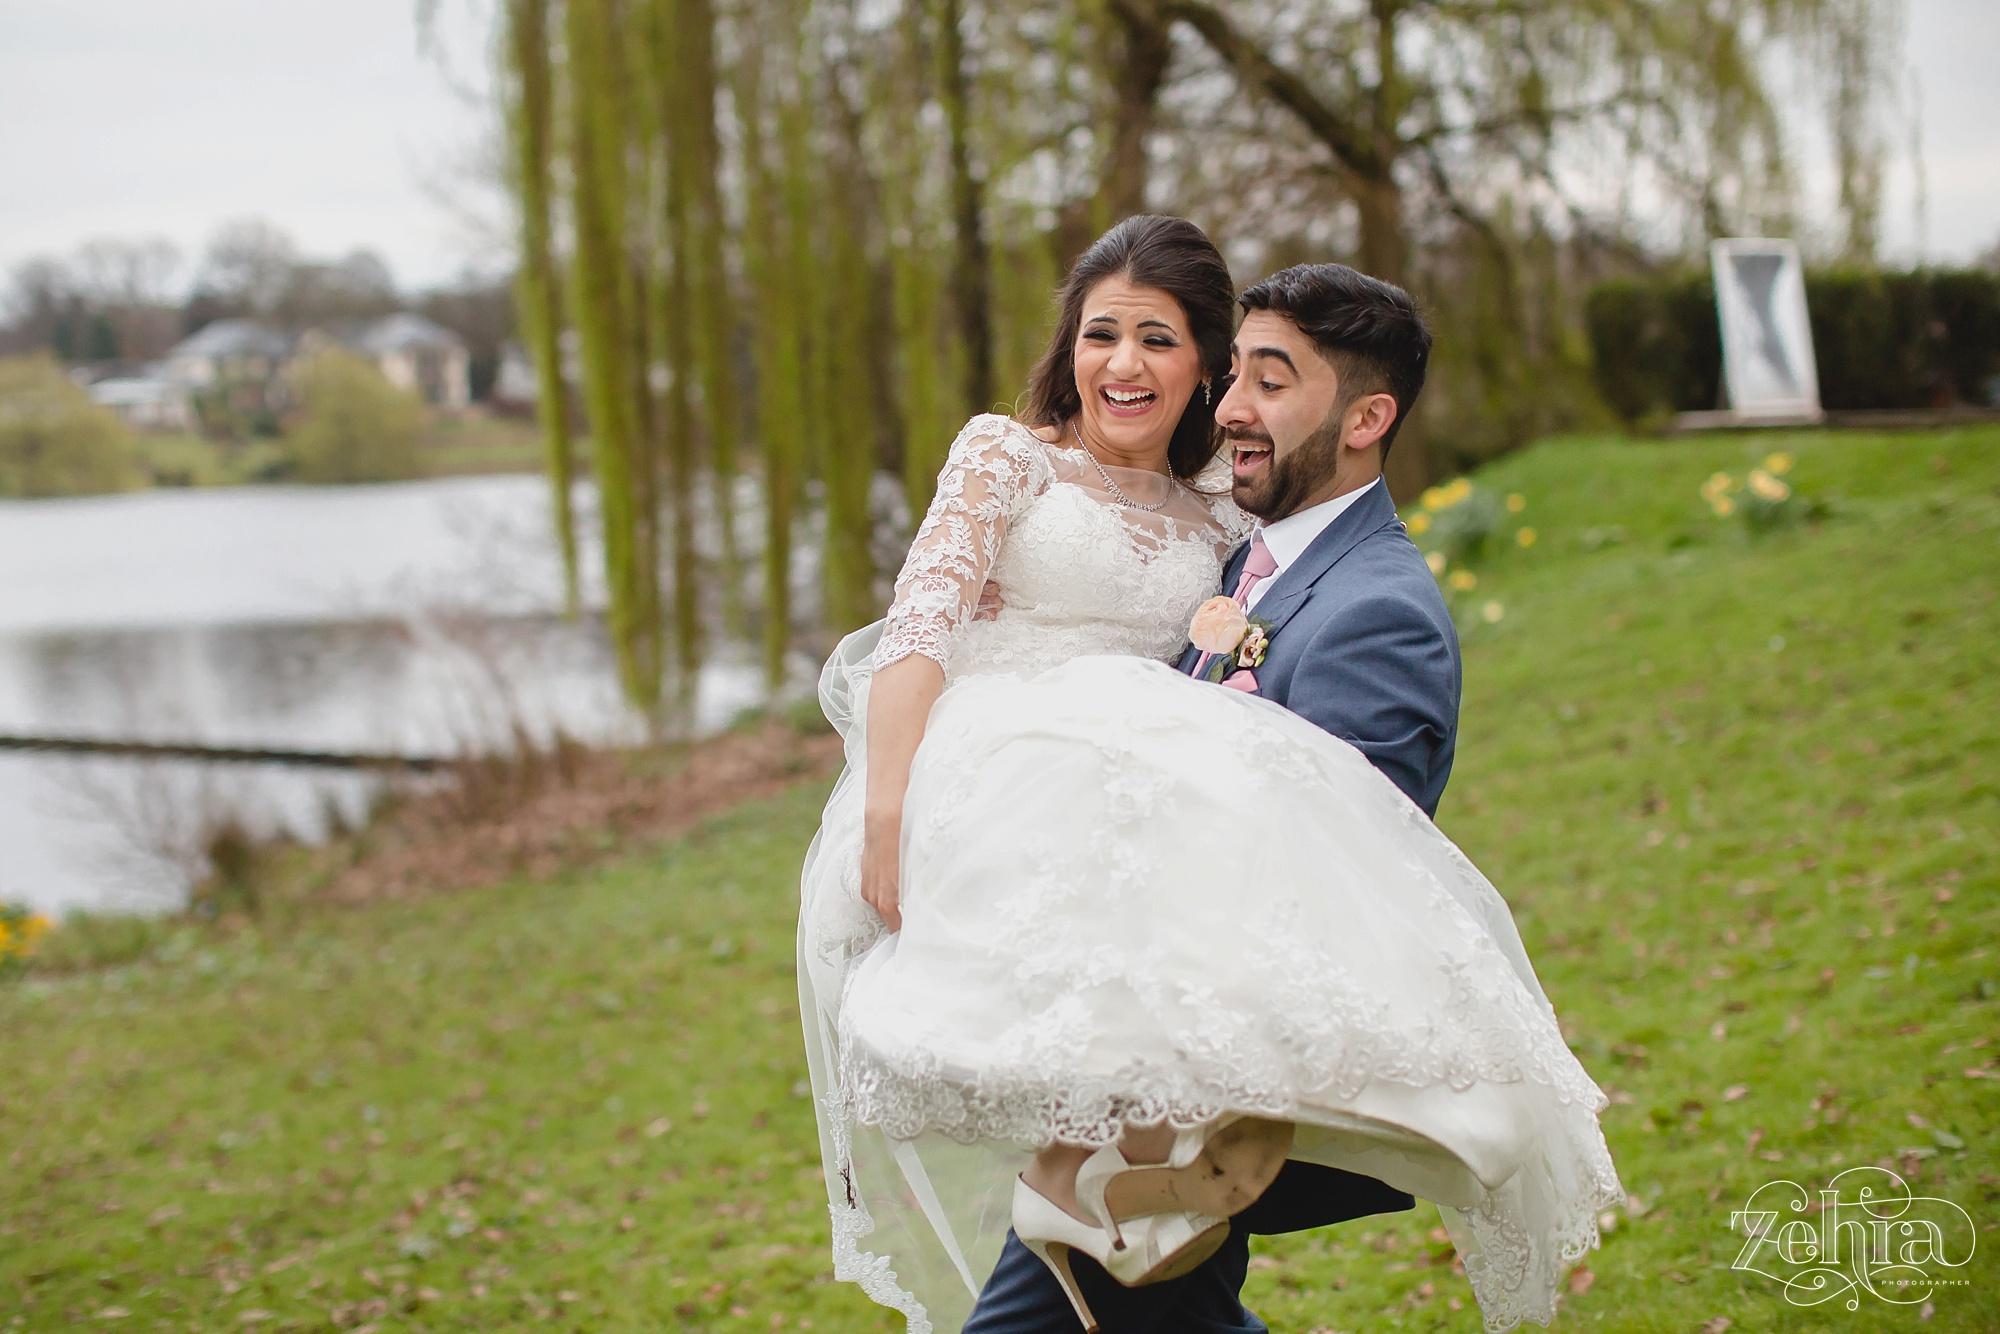 zehra photographer mere cheshire wedding_0049.jpg